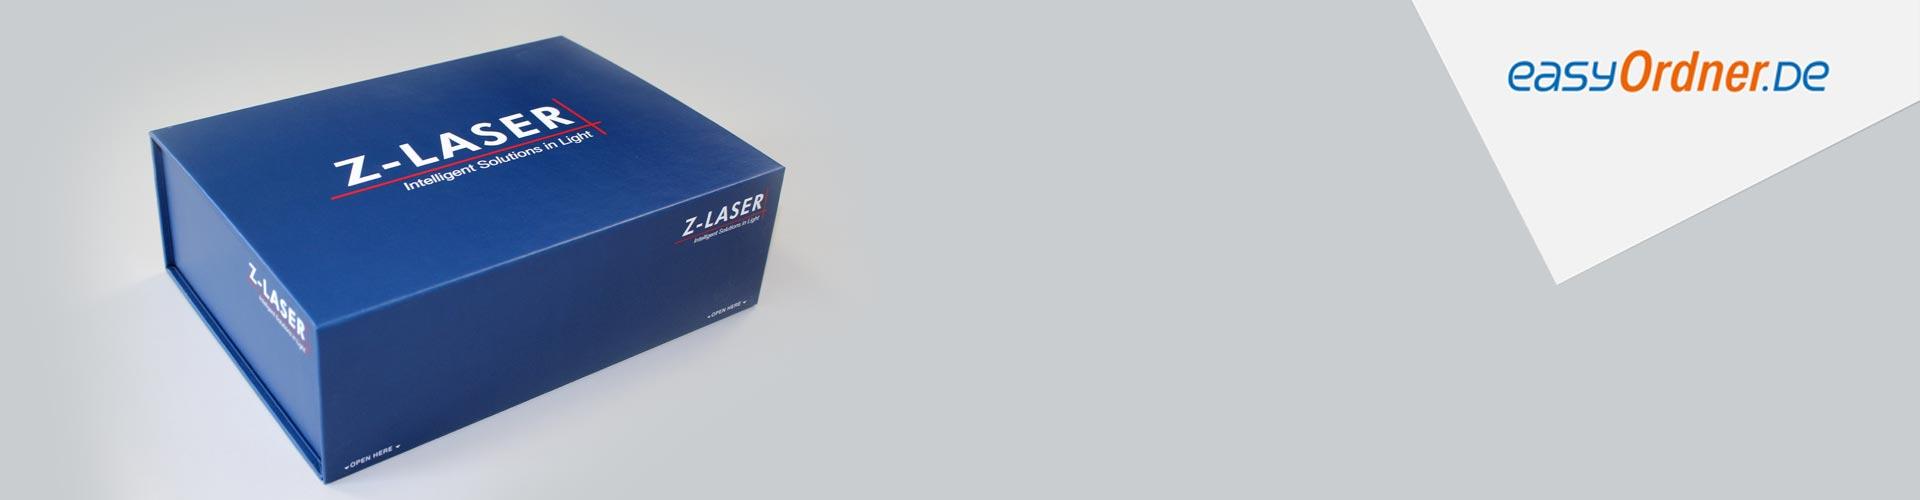 Magnetbox, Verpackung mit Magneten, Magnetverpackung, Magnetverschluss